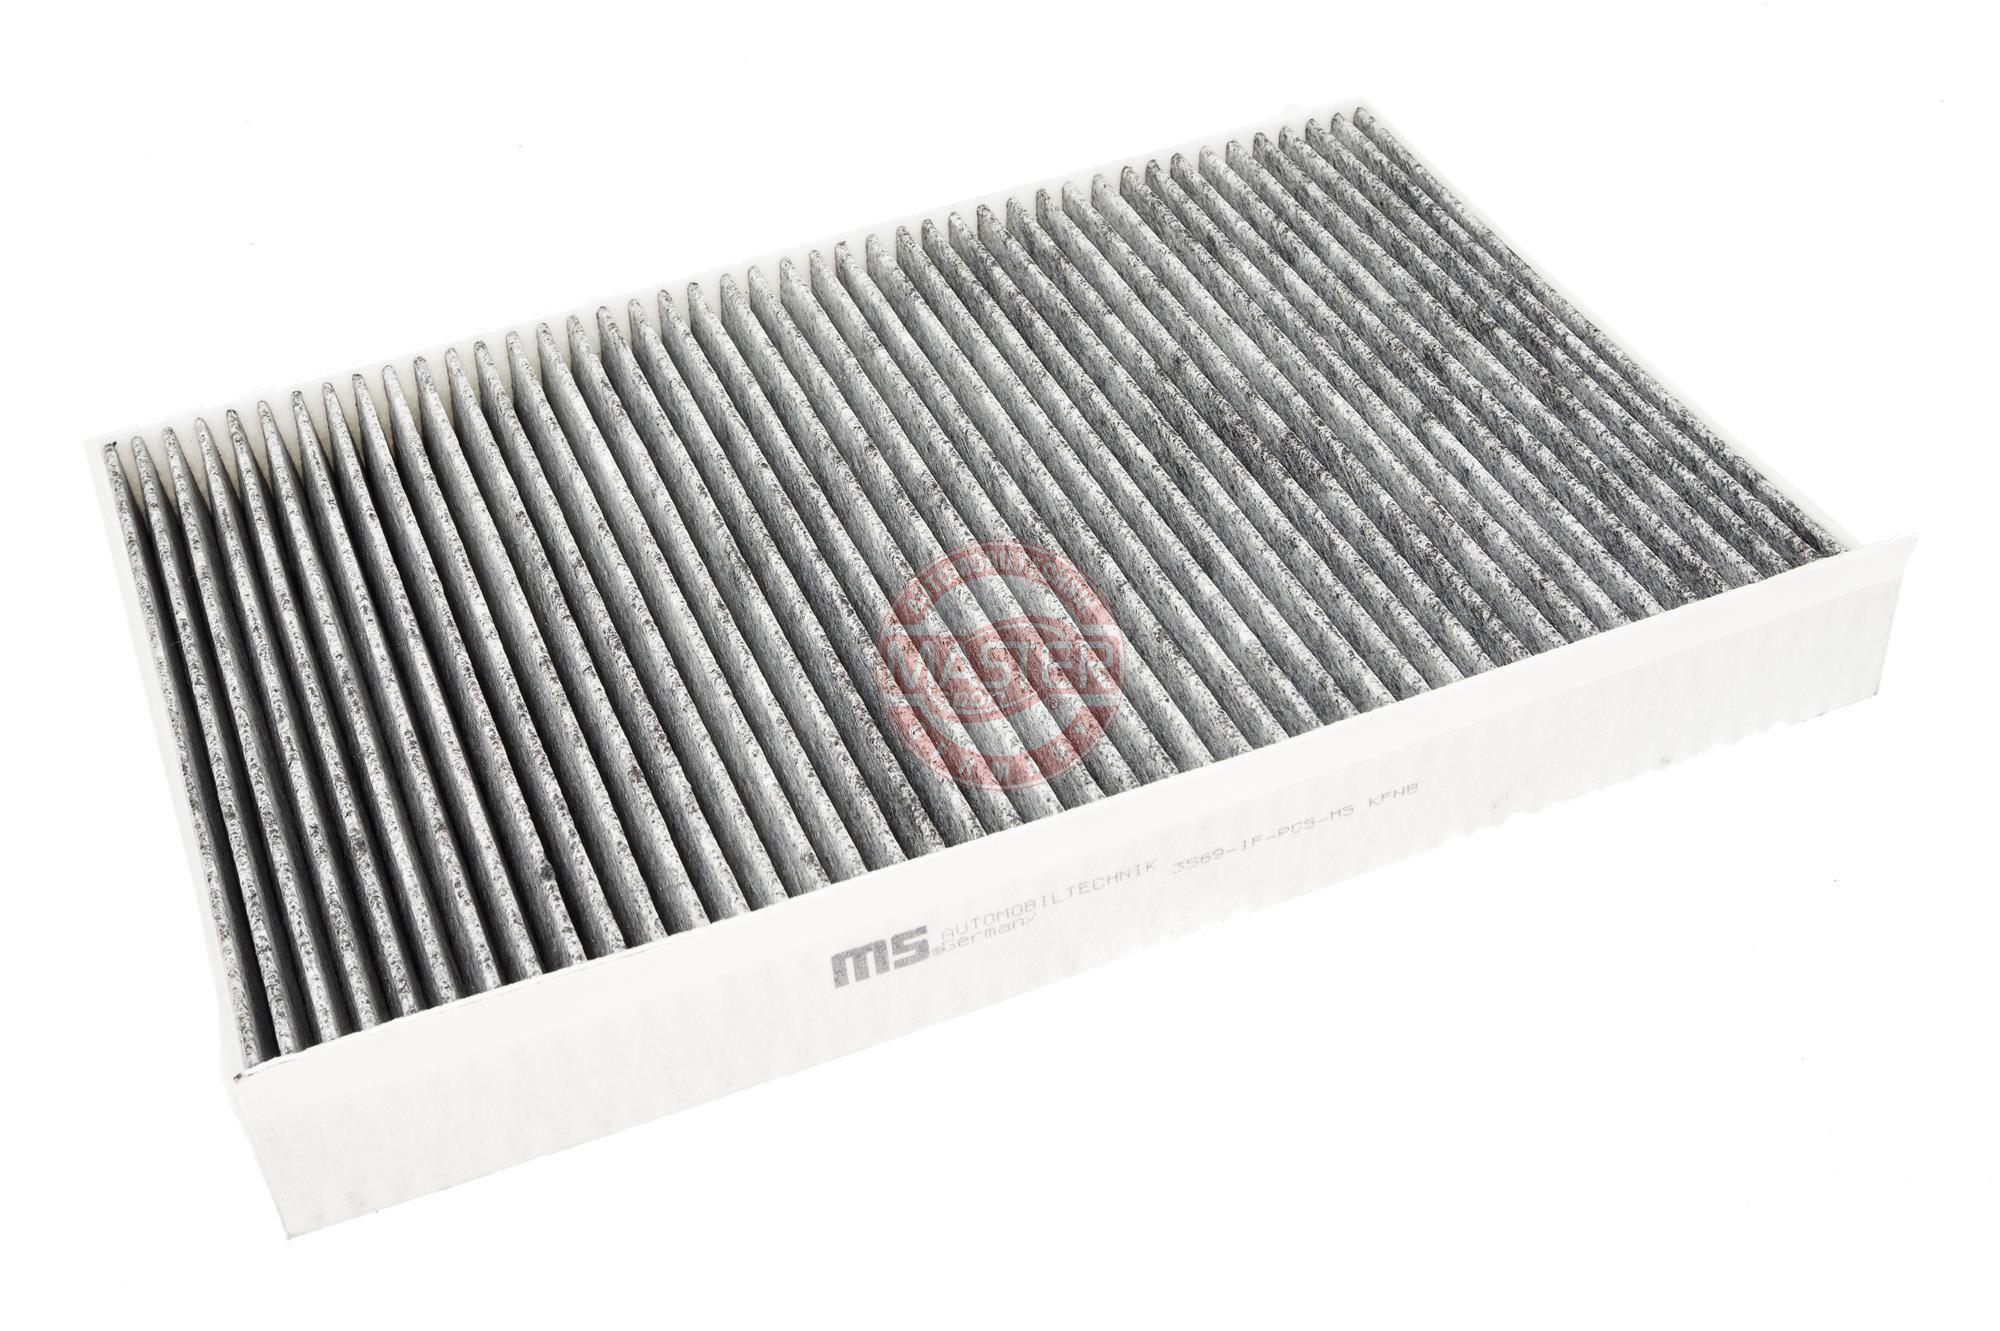 Innenraumfilter 3569-IF-PCS-MS MASTER-SPORT 420035690 in Original Qualität